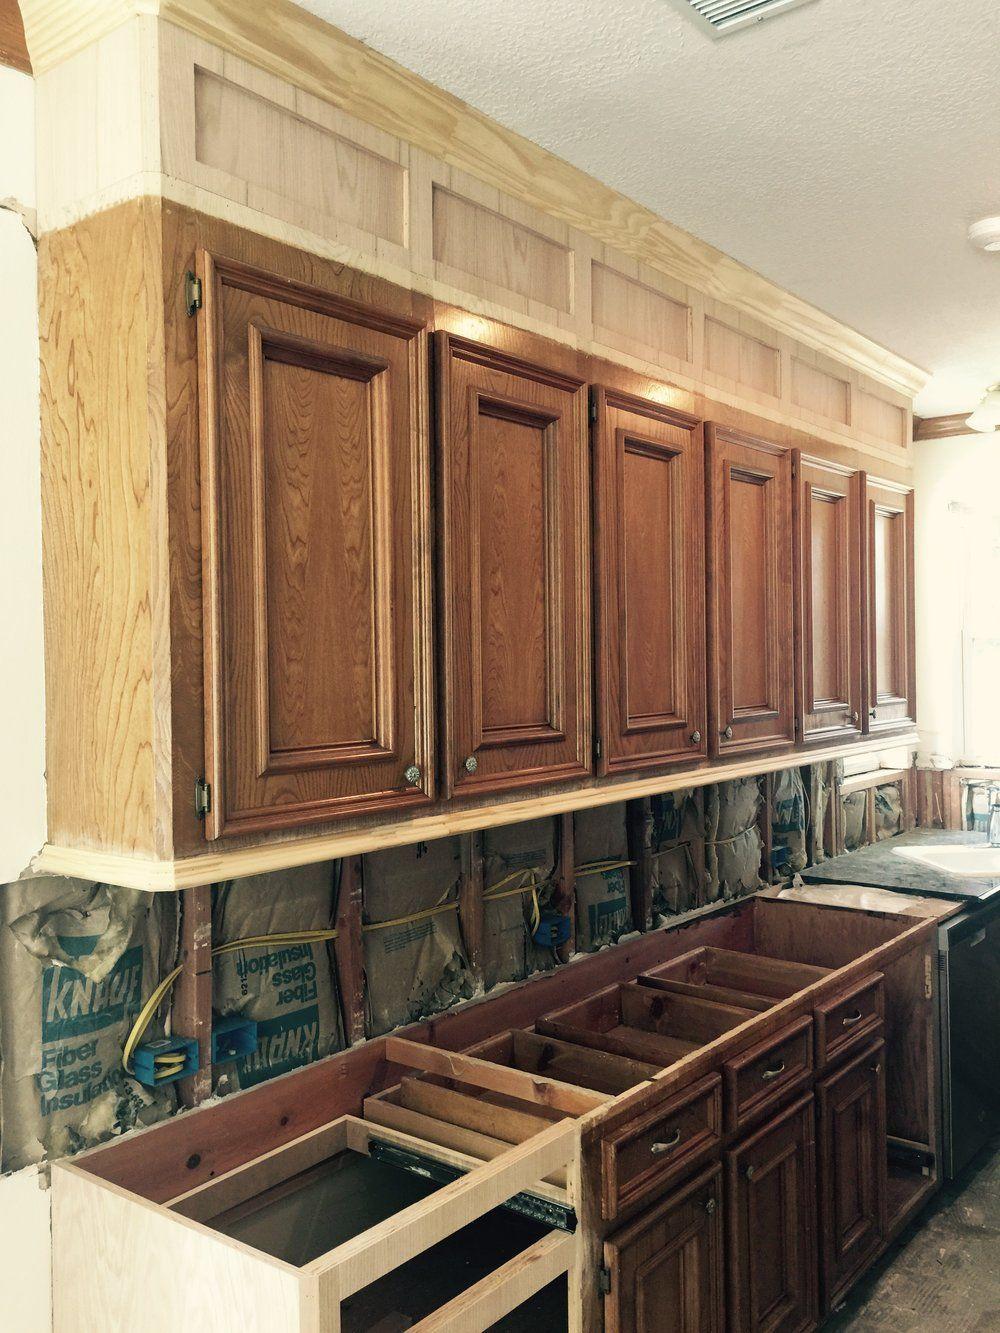 Kitchen cabinets under construction kitchenmakeovers Kitchen cabinets